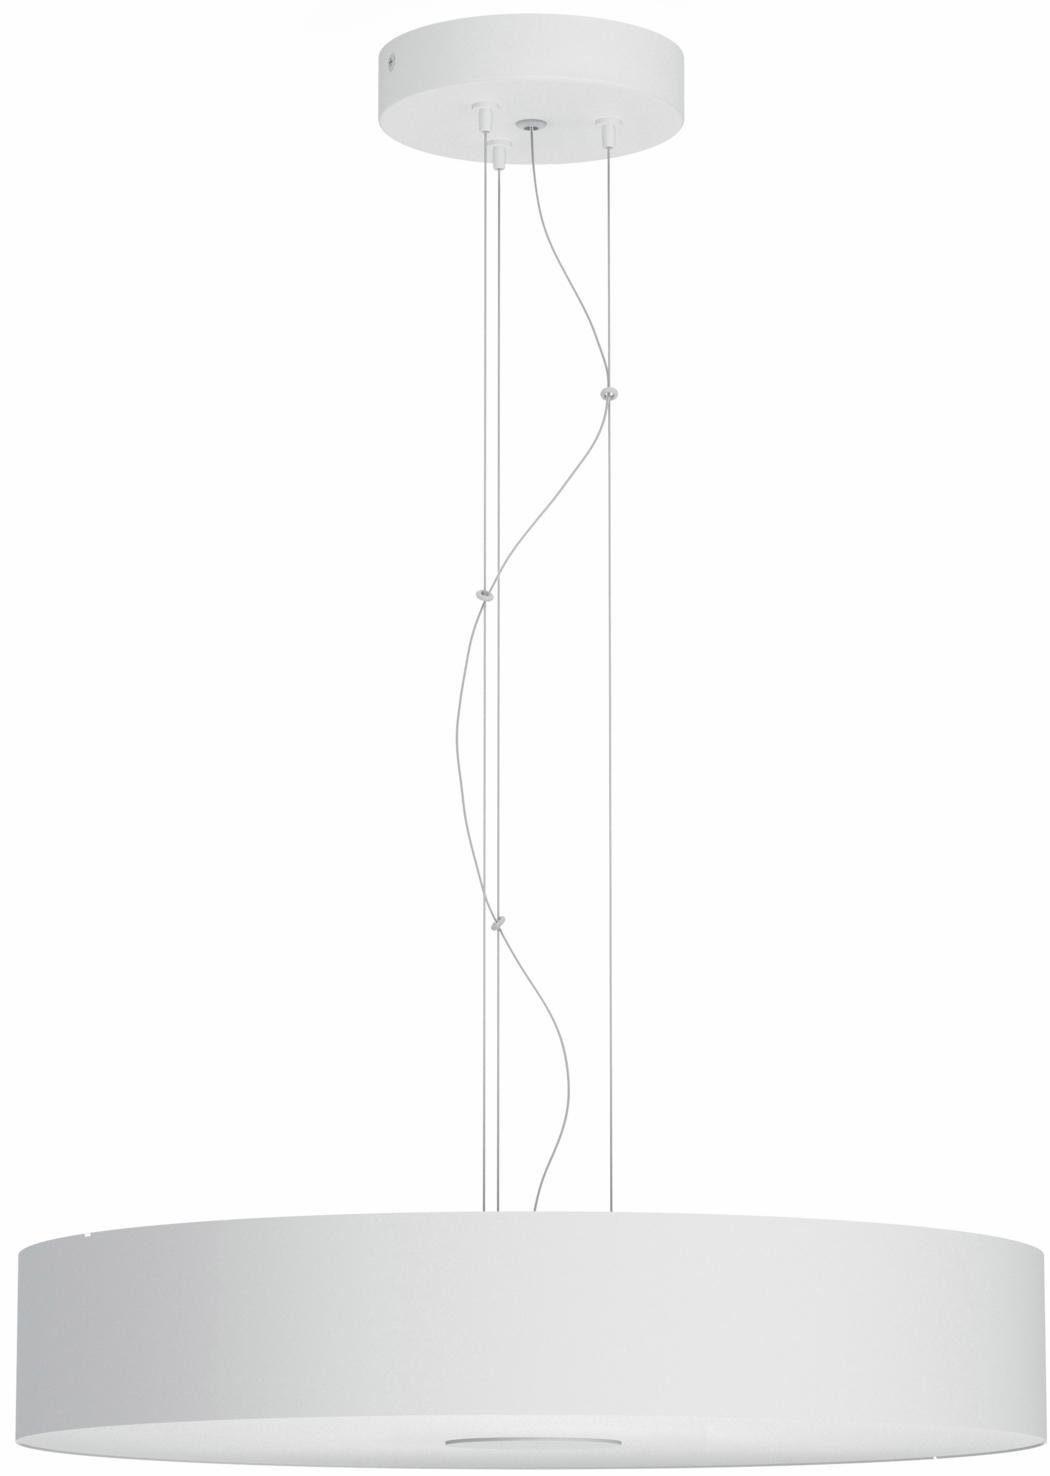 Philips Hue LED Pendelleuchte »Fair«, 1-flammig, Smart Home